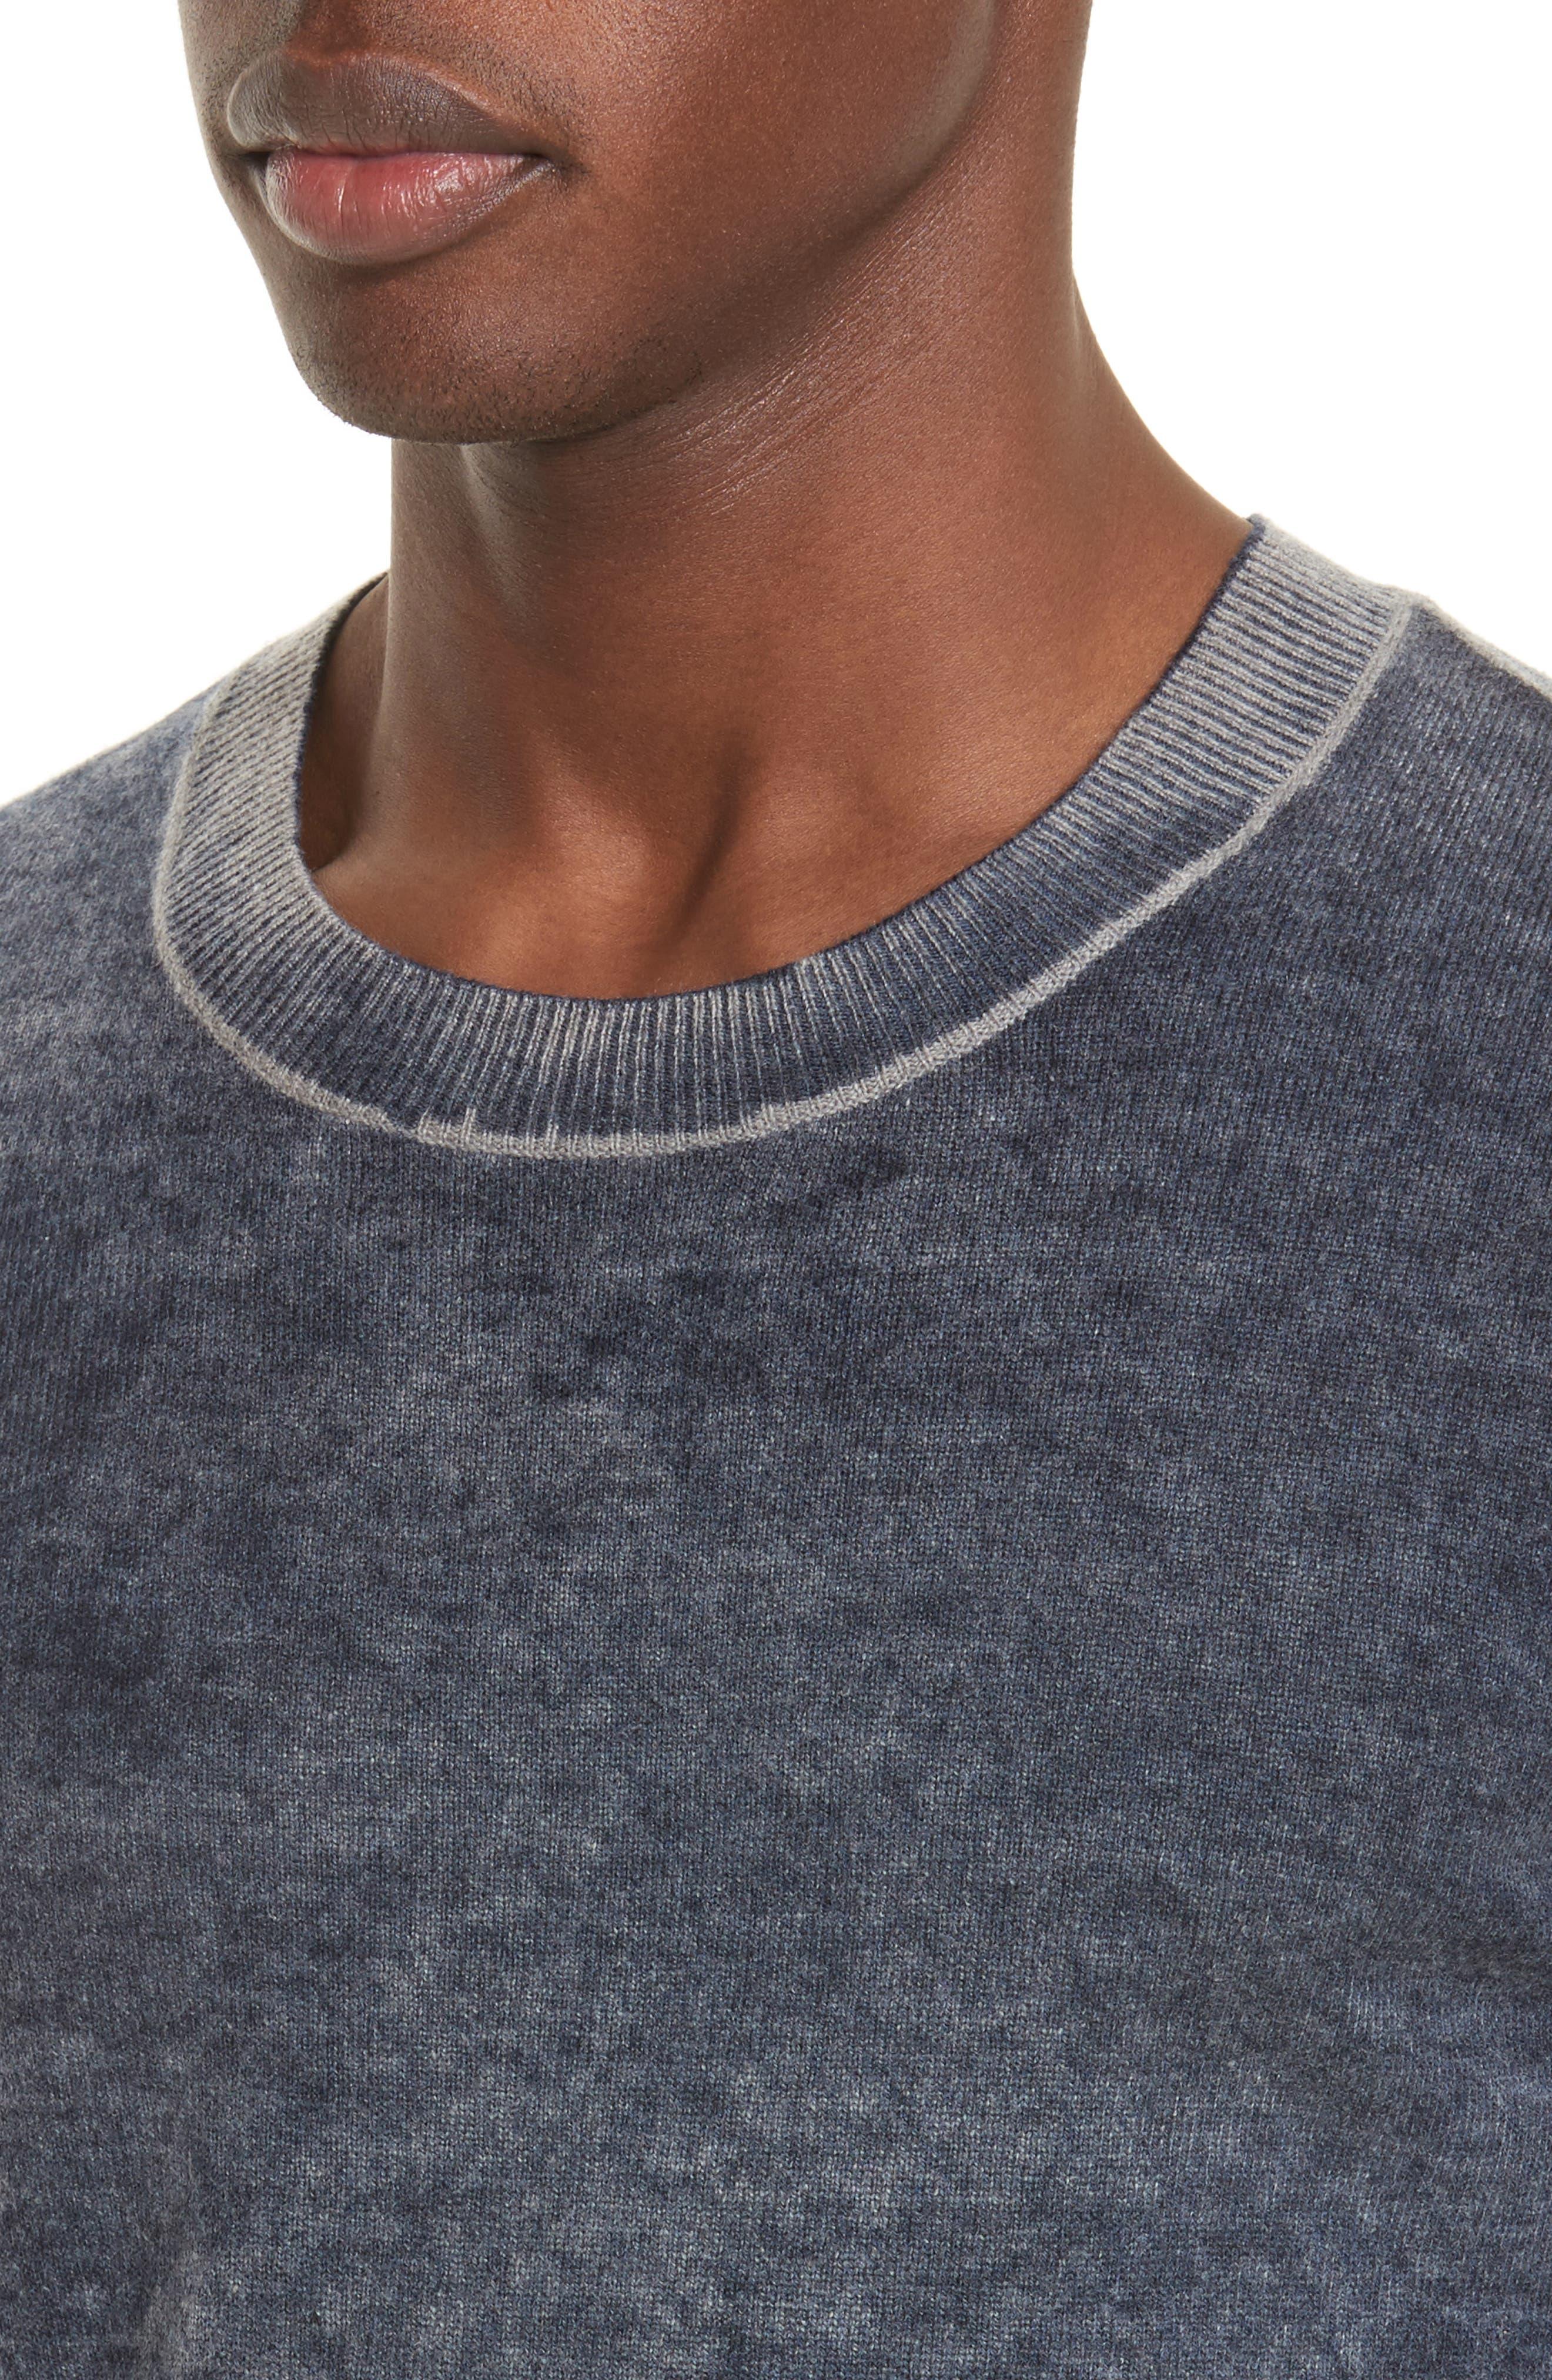 Acid Wash Sweater,                             Alternate thumbnail 4, color,                             410